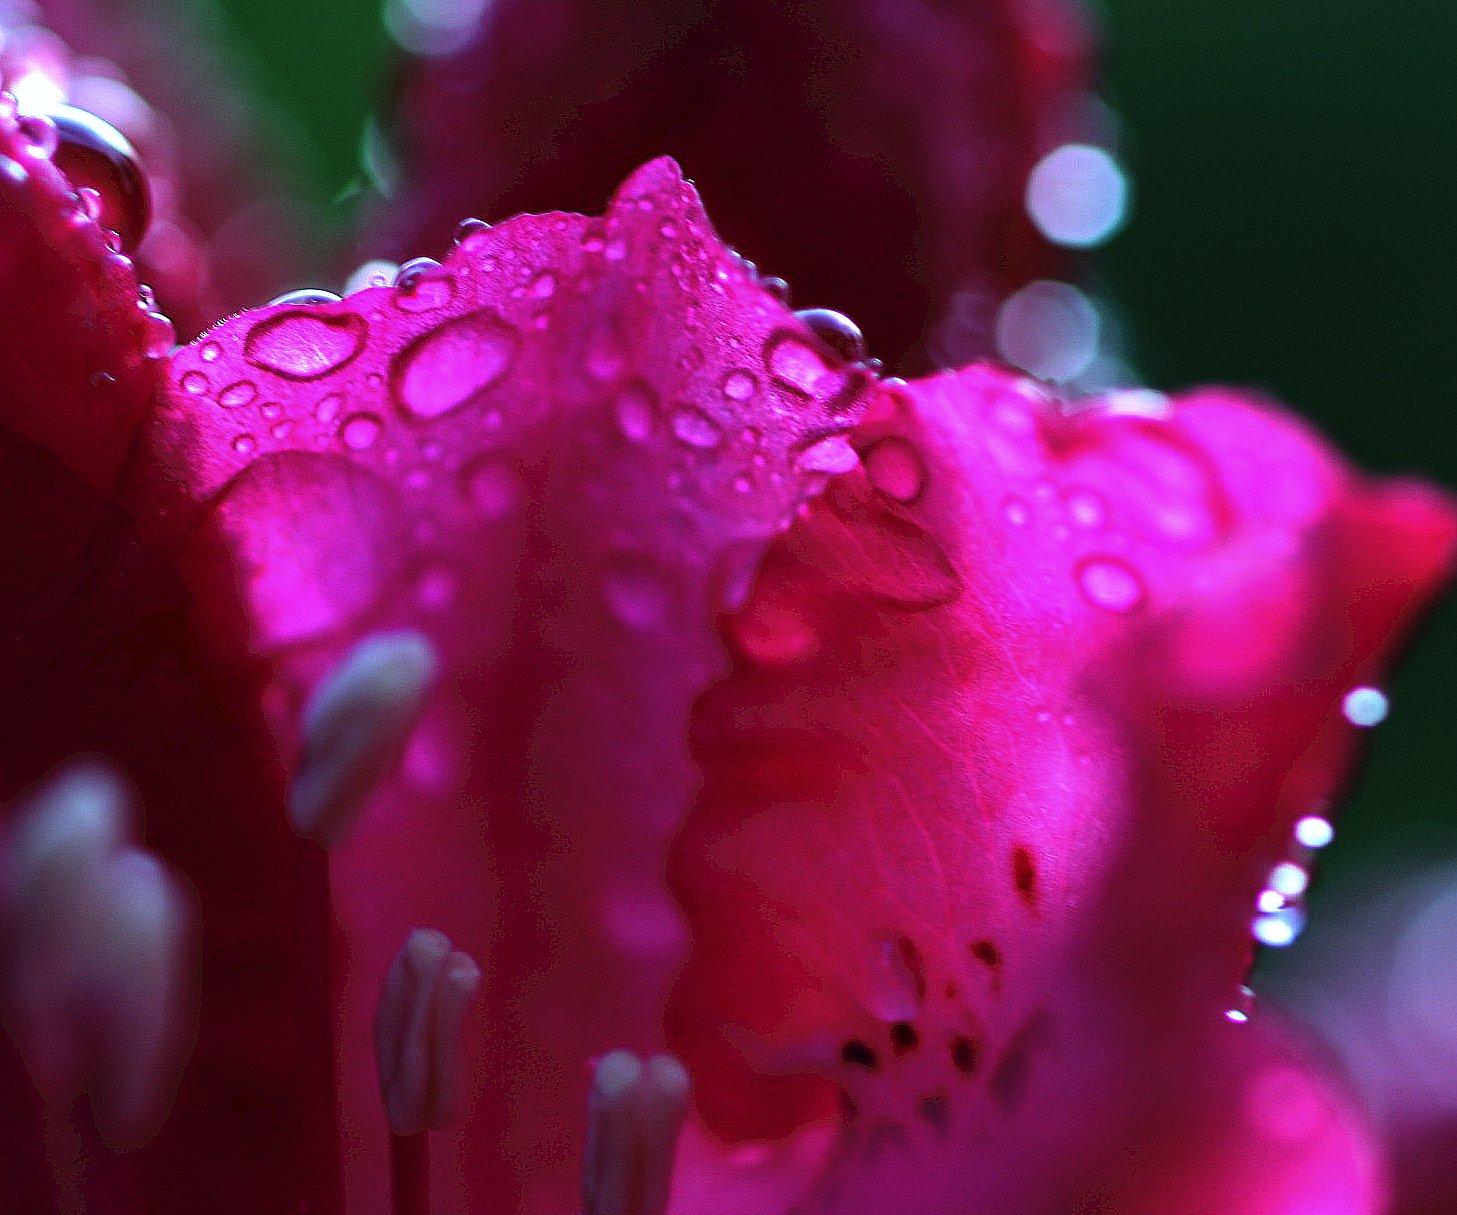 Wallpaper Garden Water Red Blossom Pink Dew Magenta